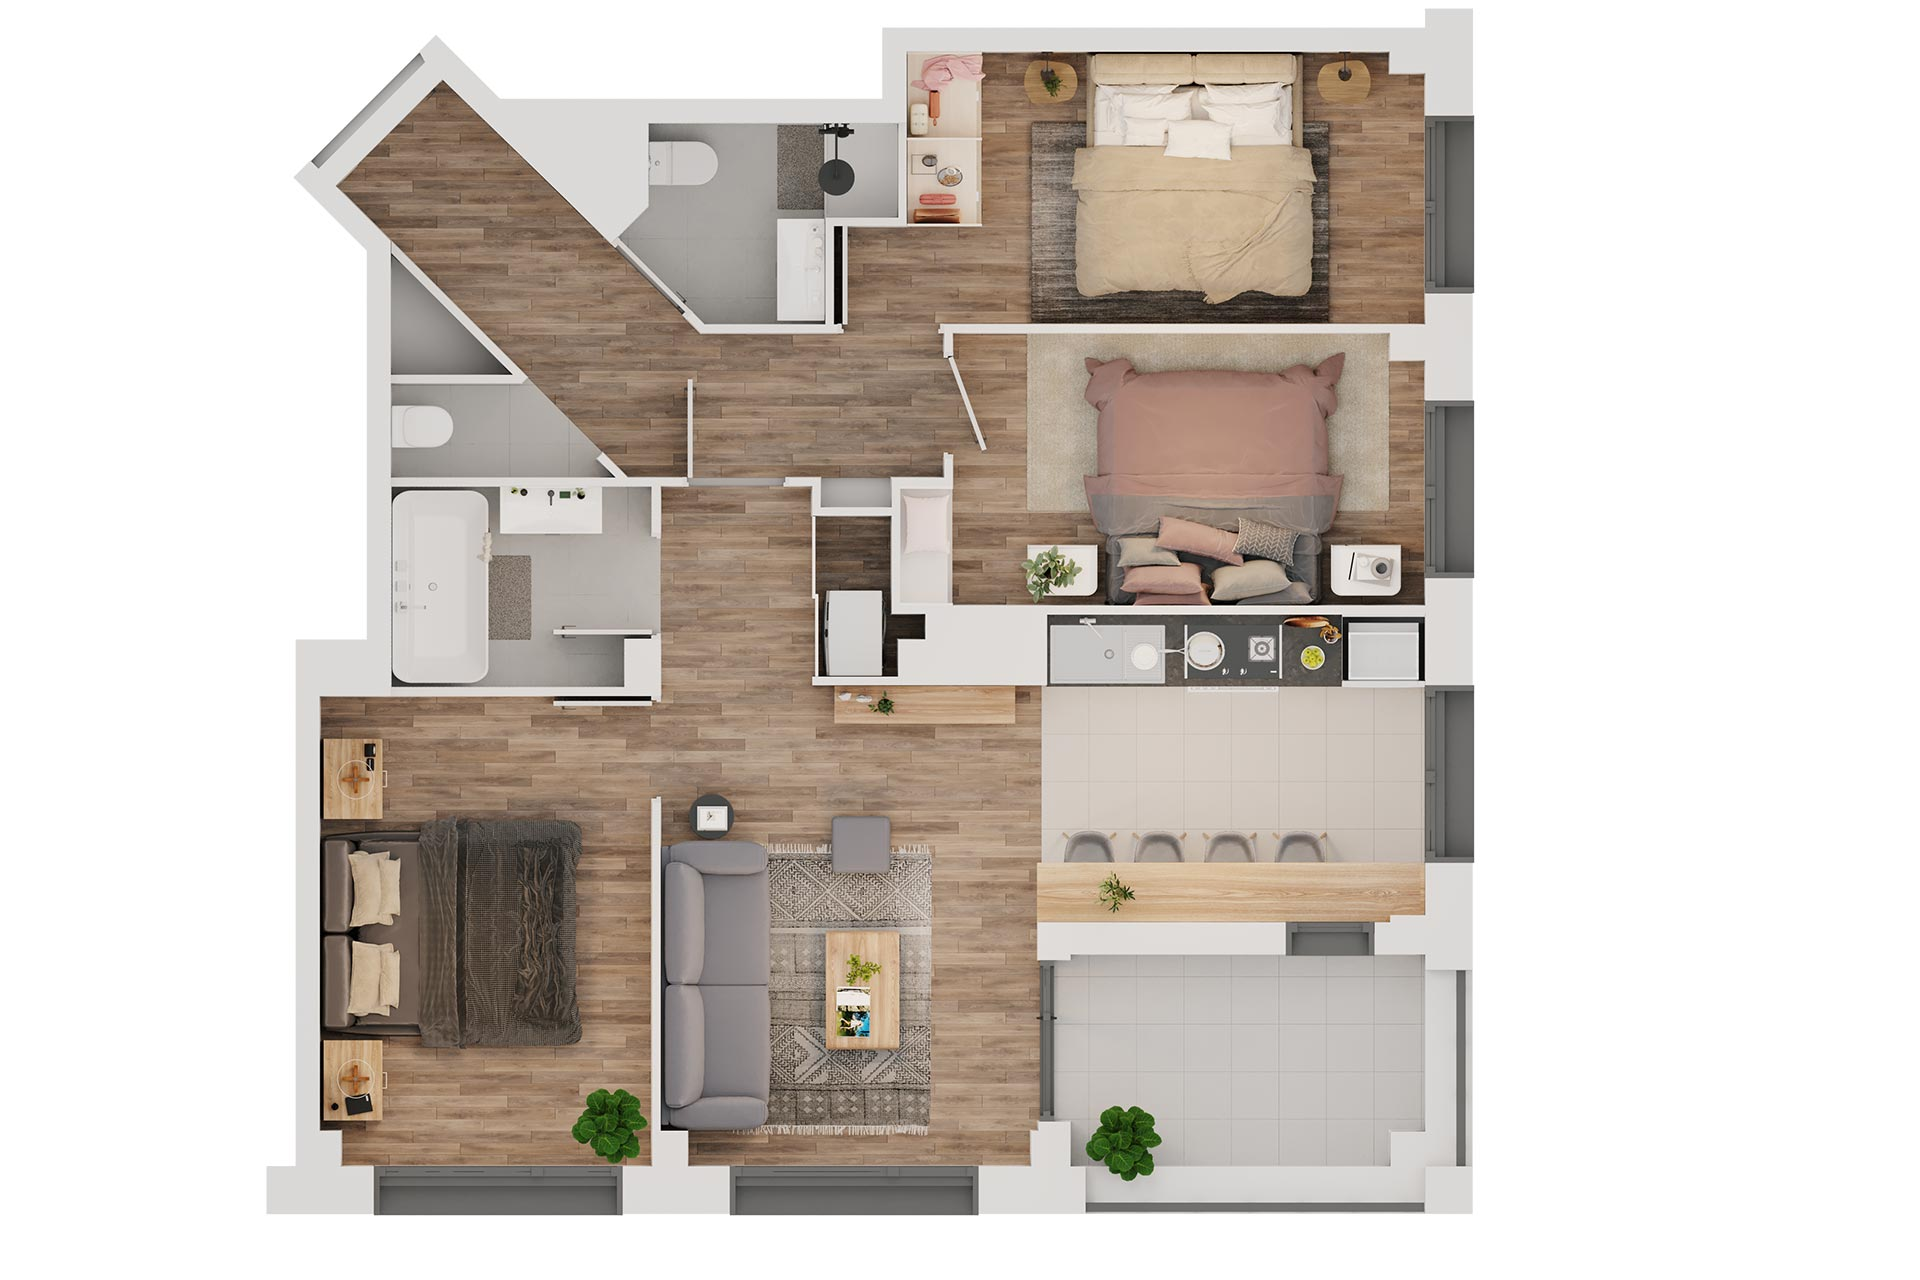 Interior 3D Floor plan